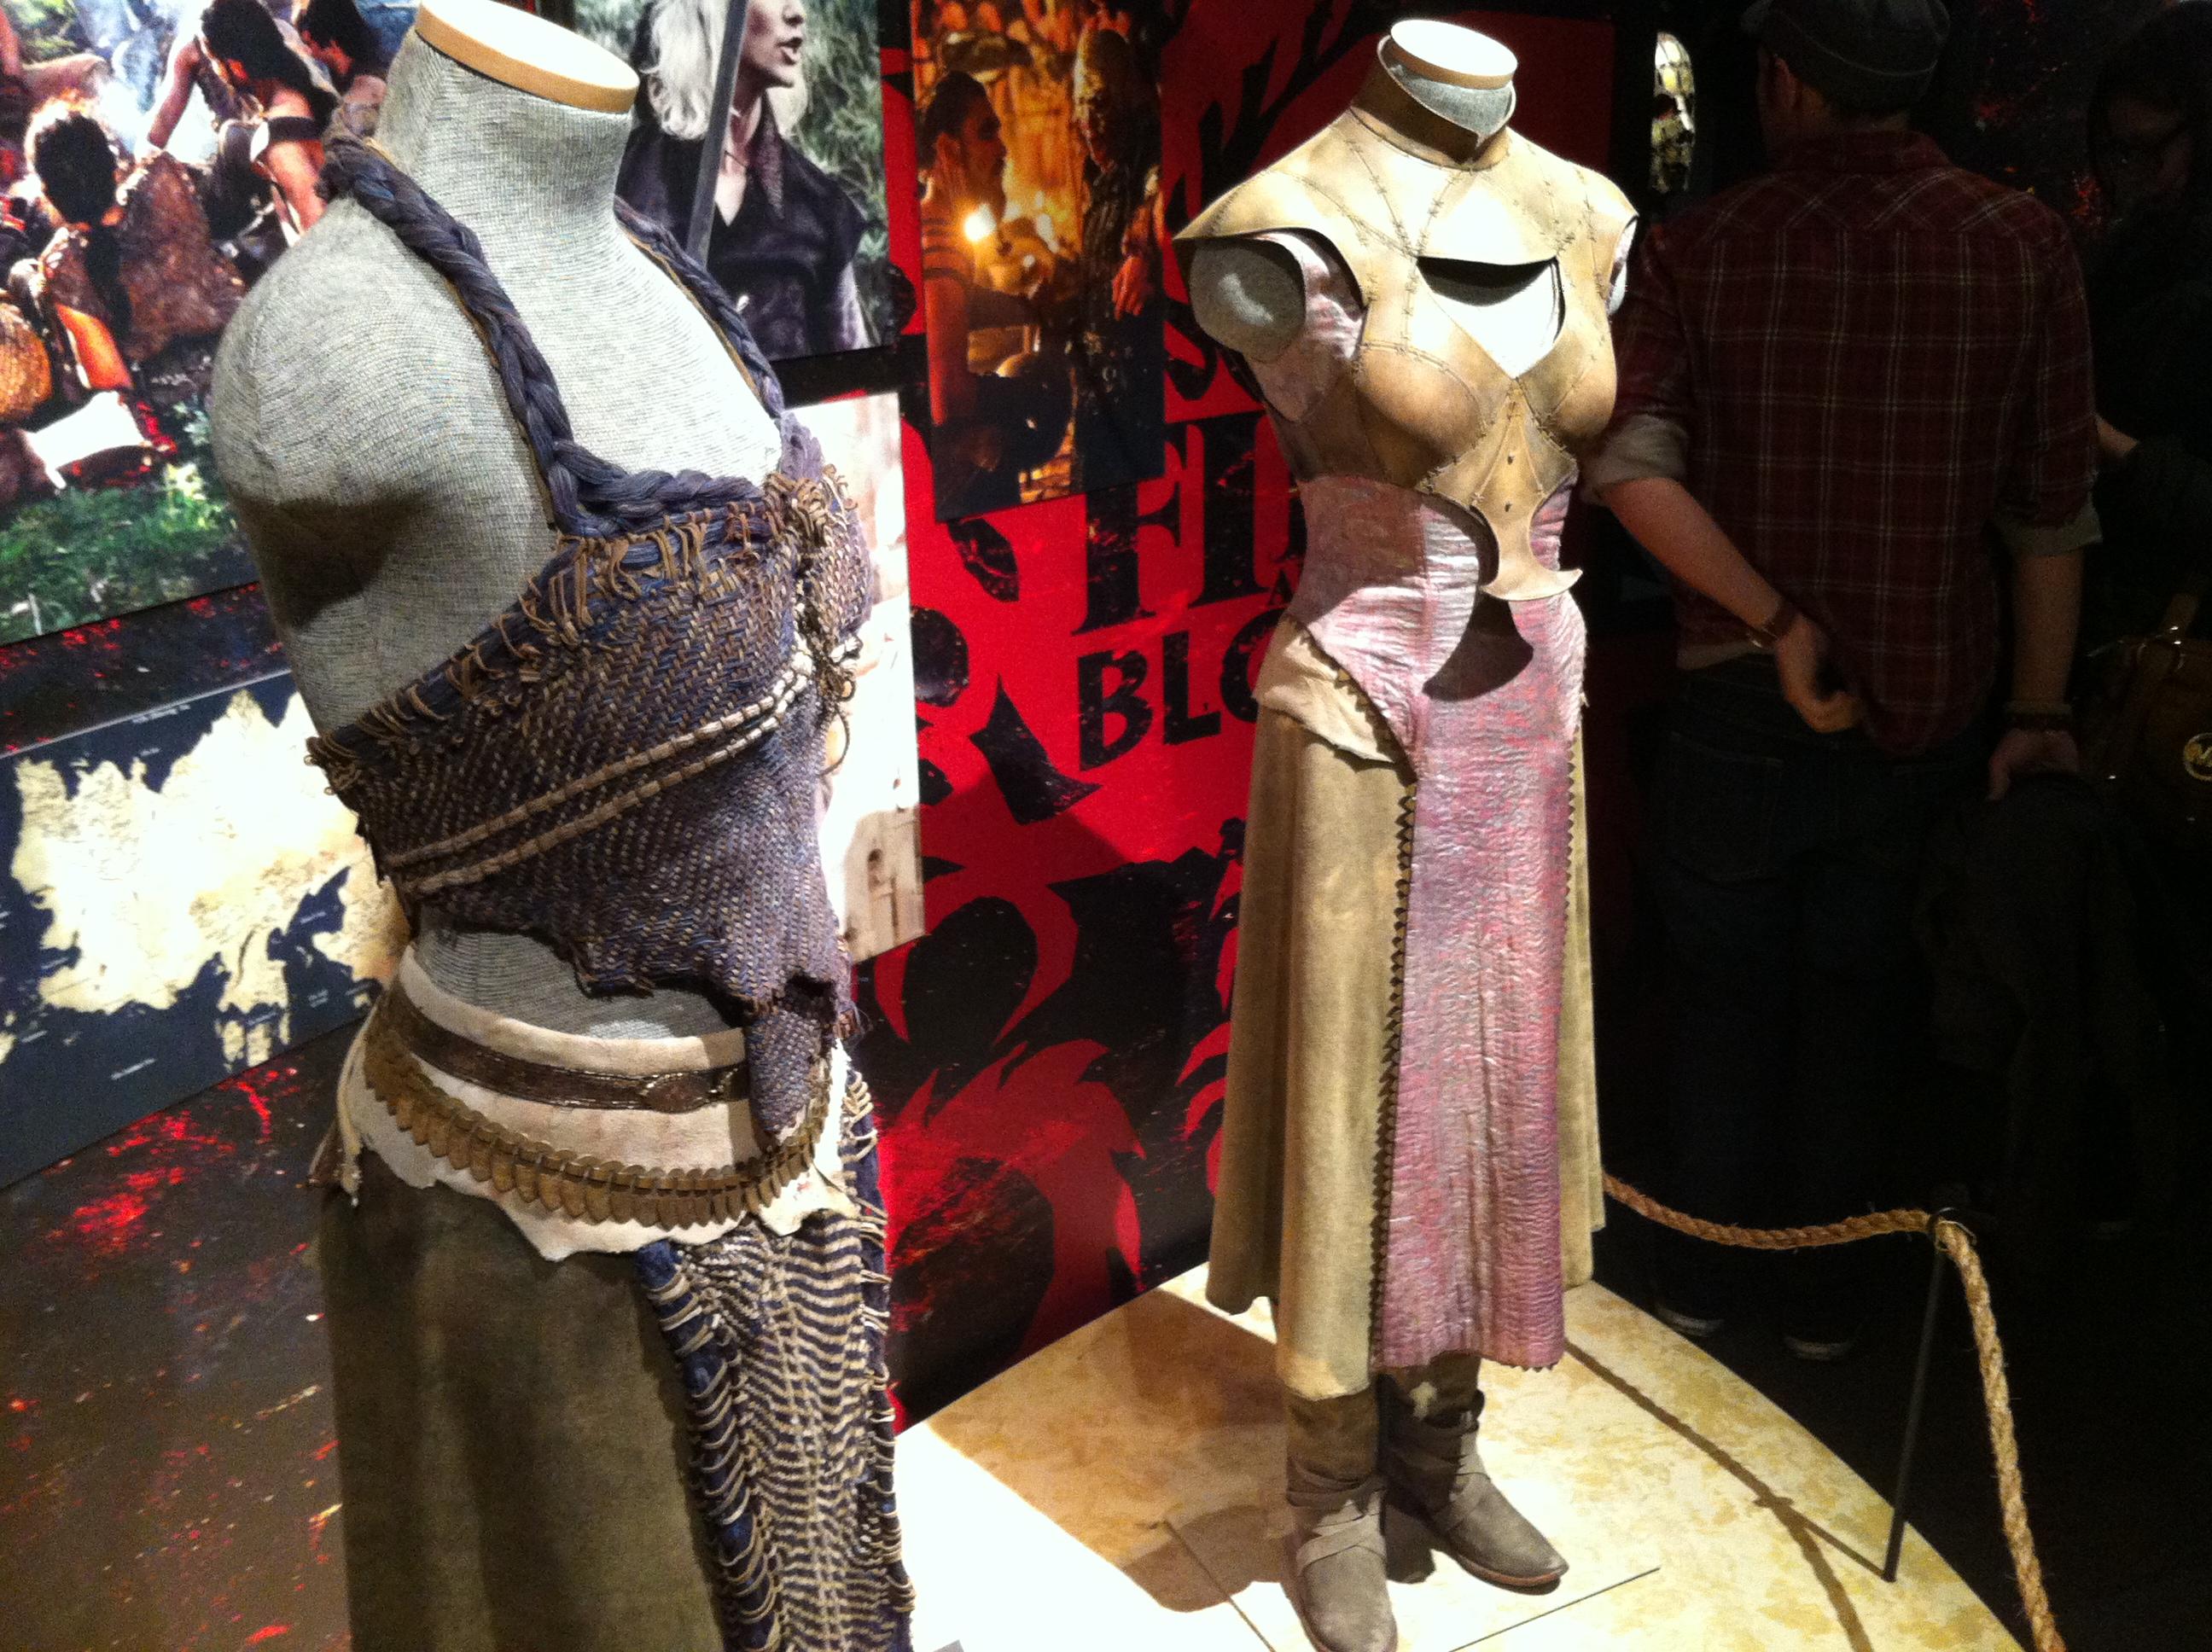 Game of Thrones exhibit NYC